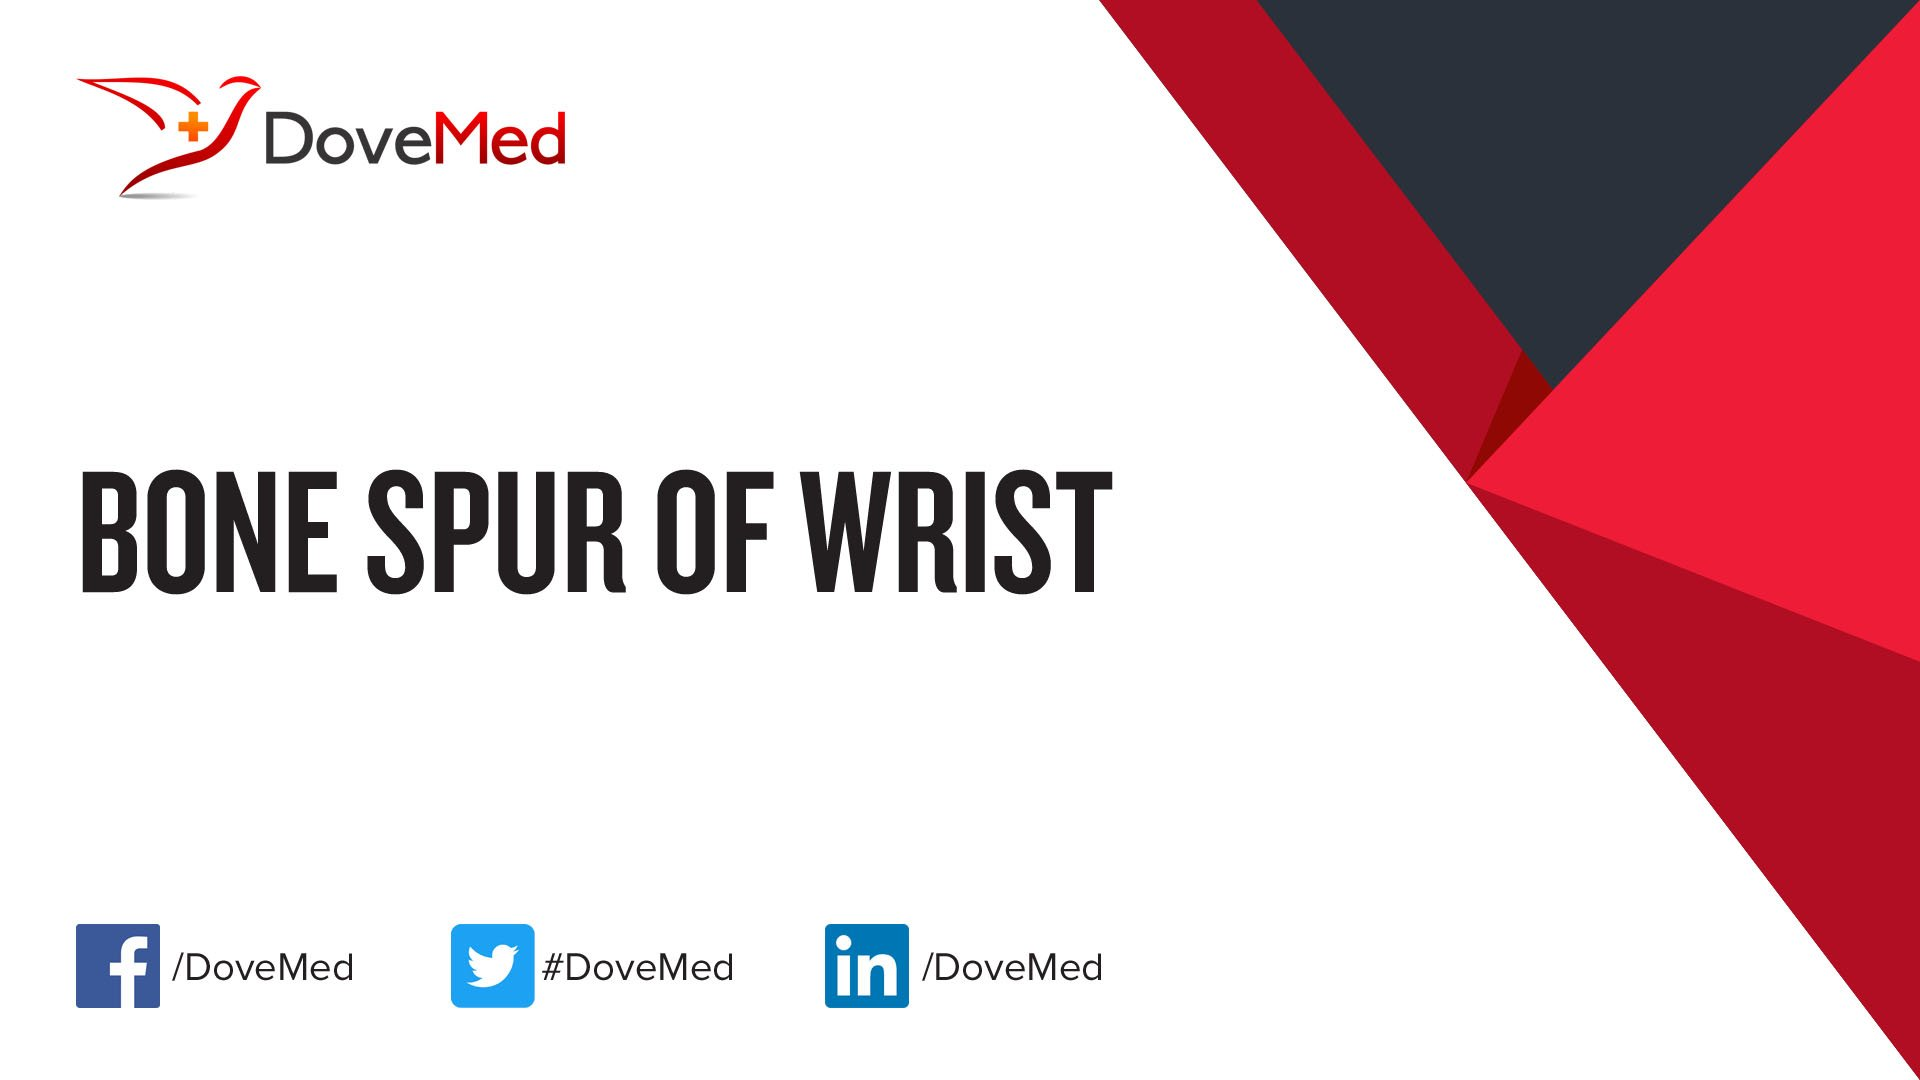 Bone Spur of Wrist